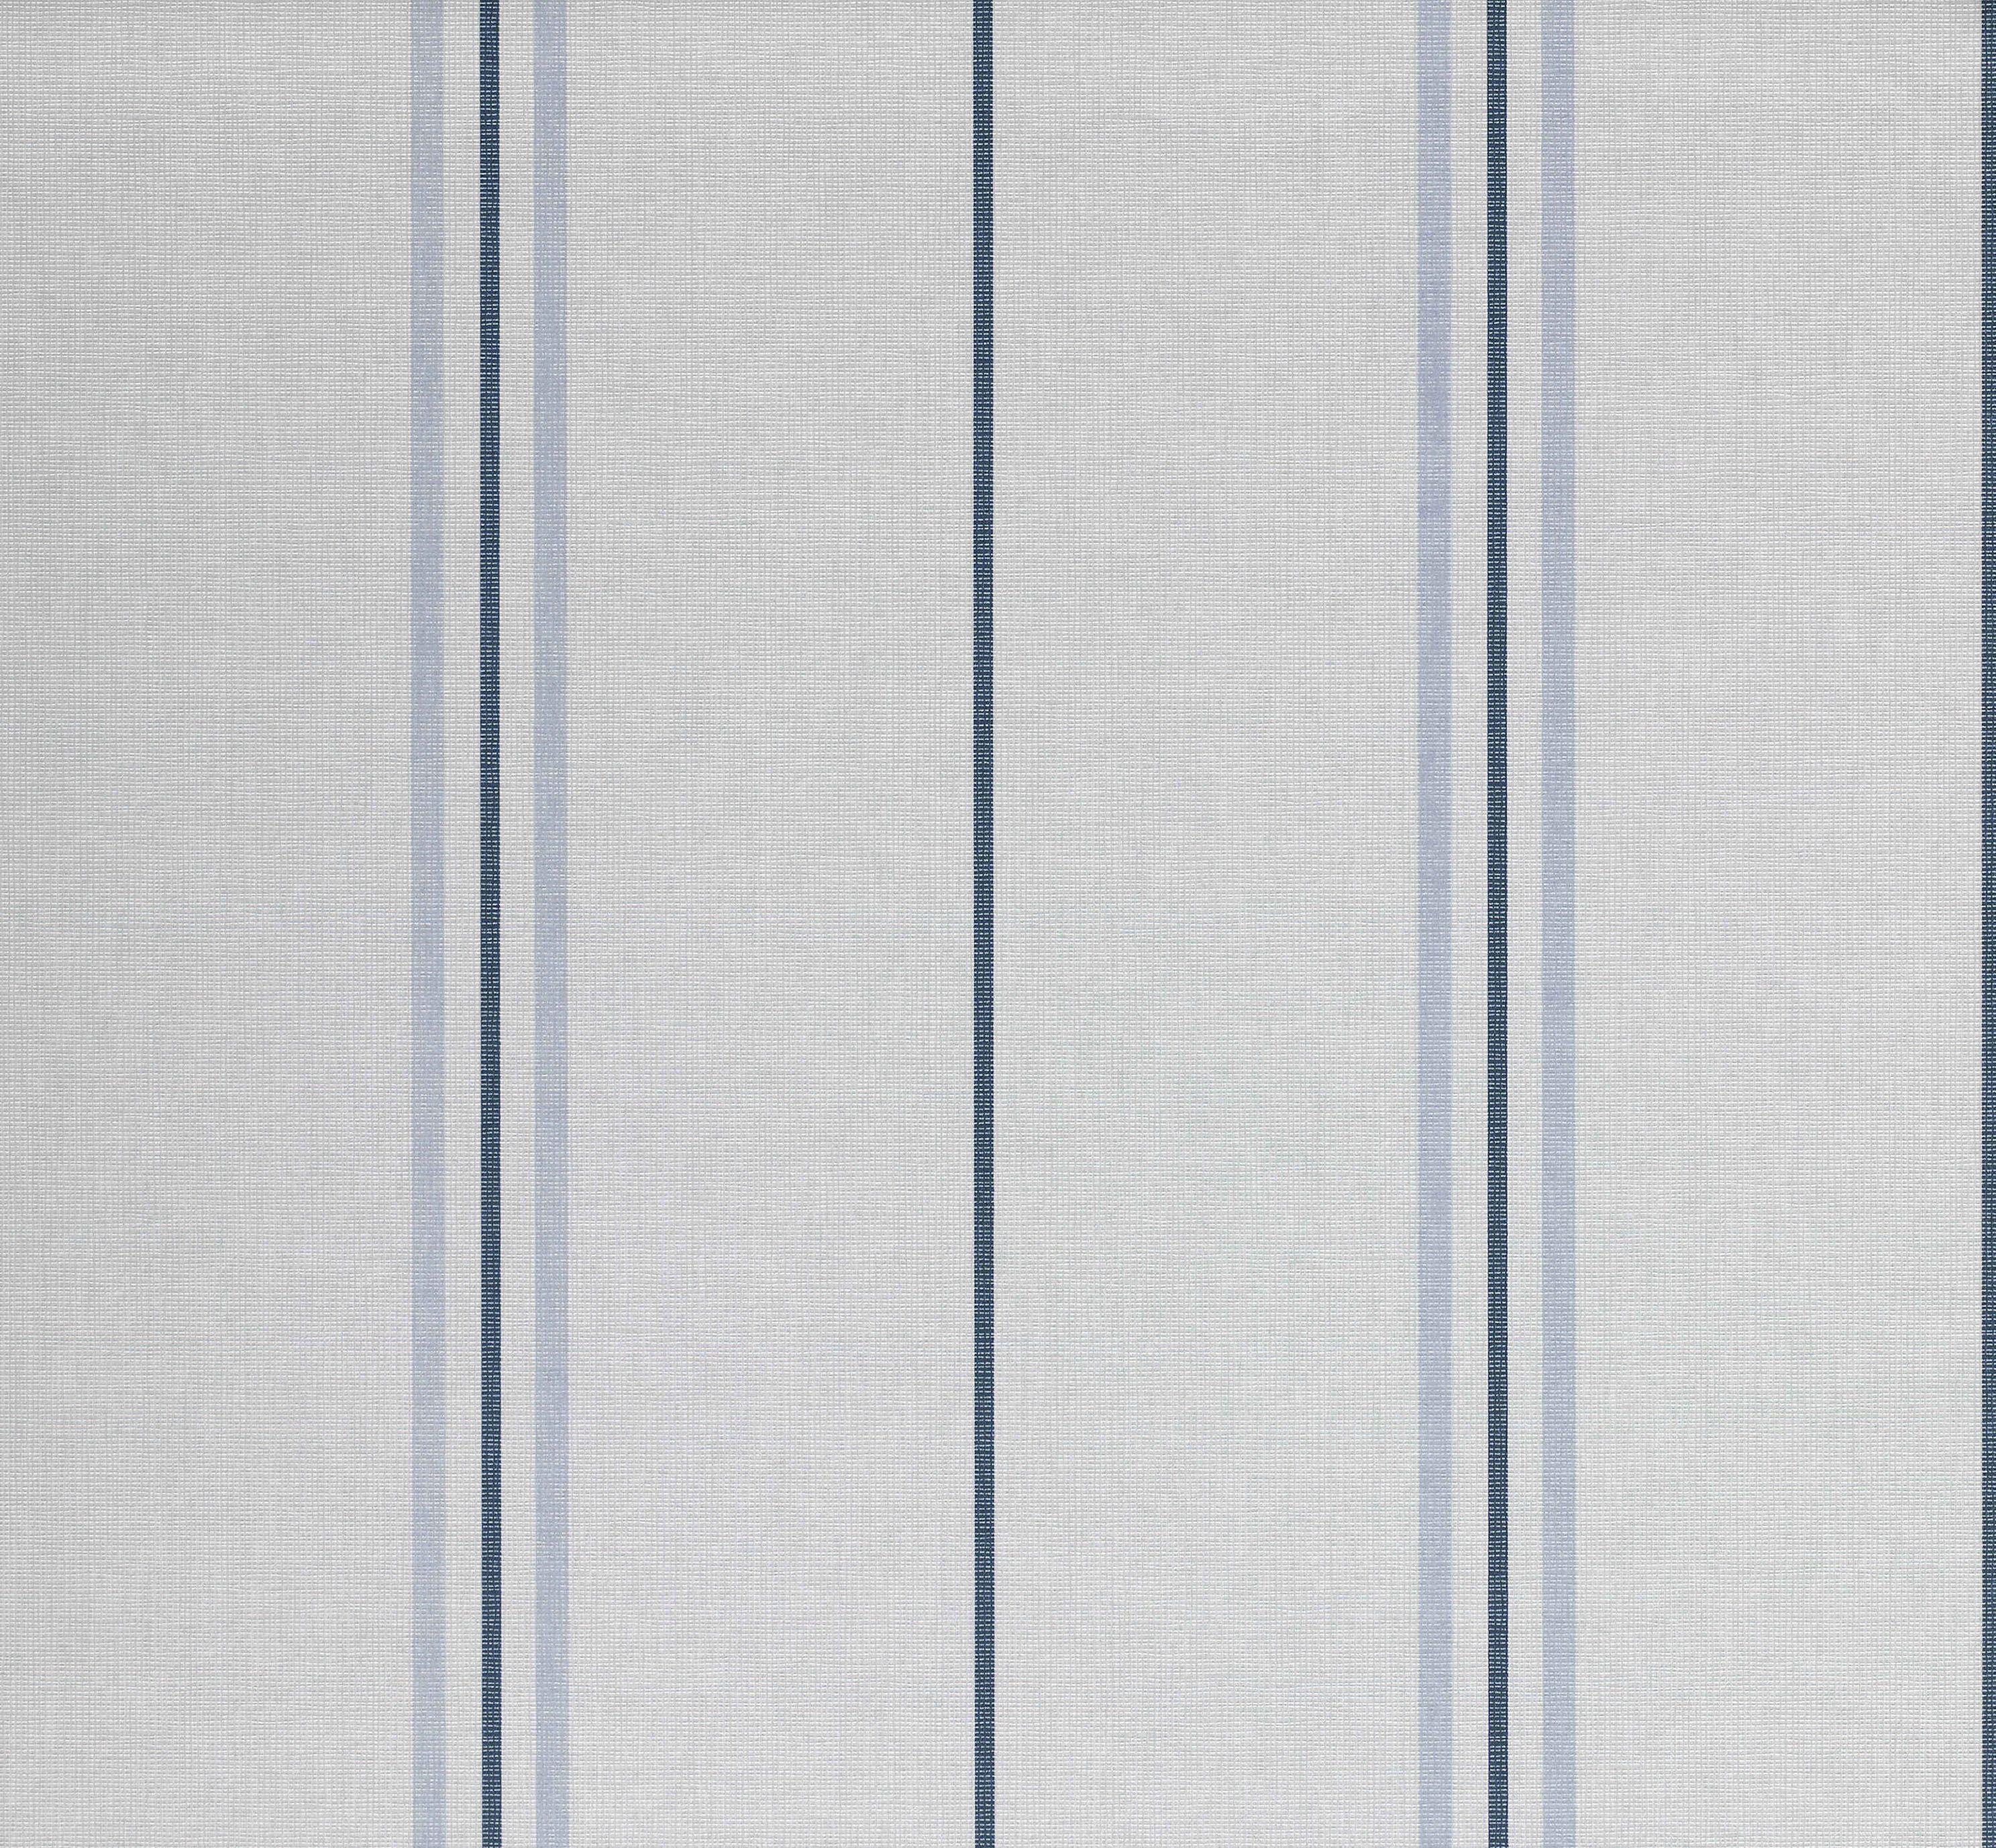 Ines de la Freesange 'Rayure ' Wallpaper Design reference